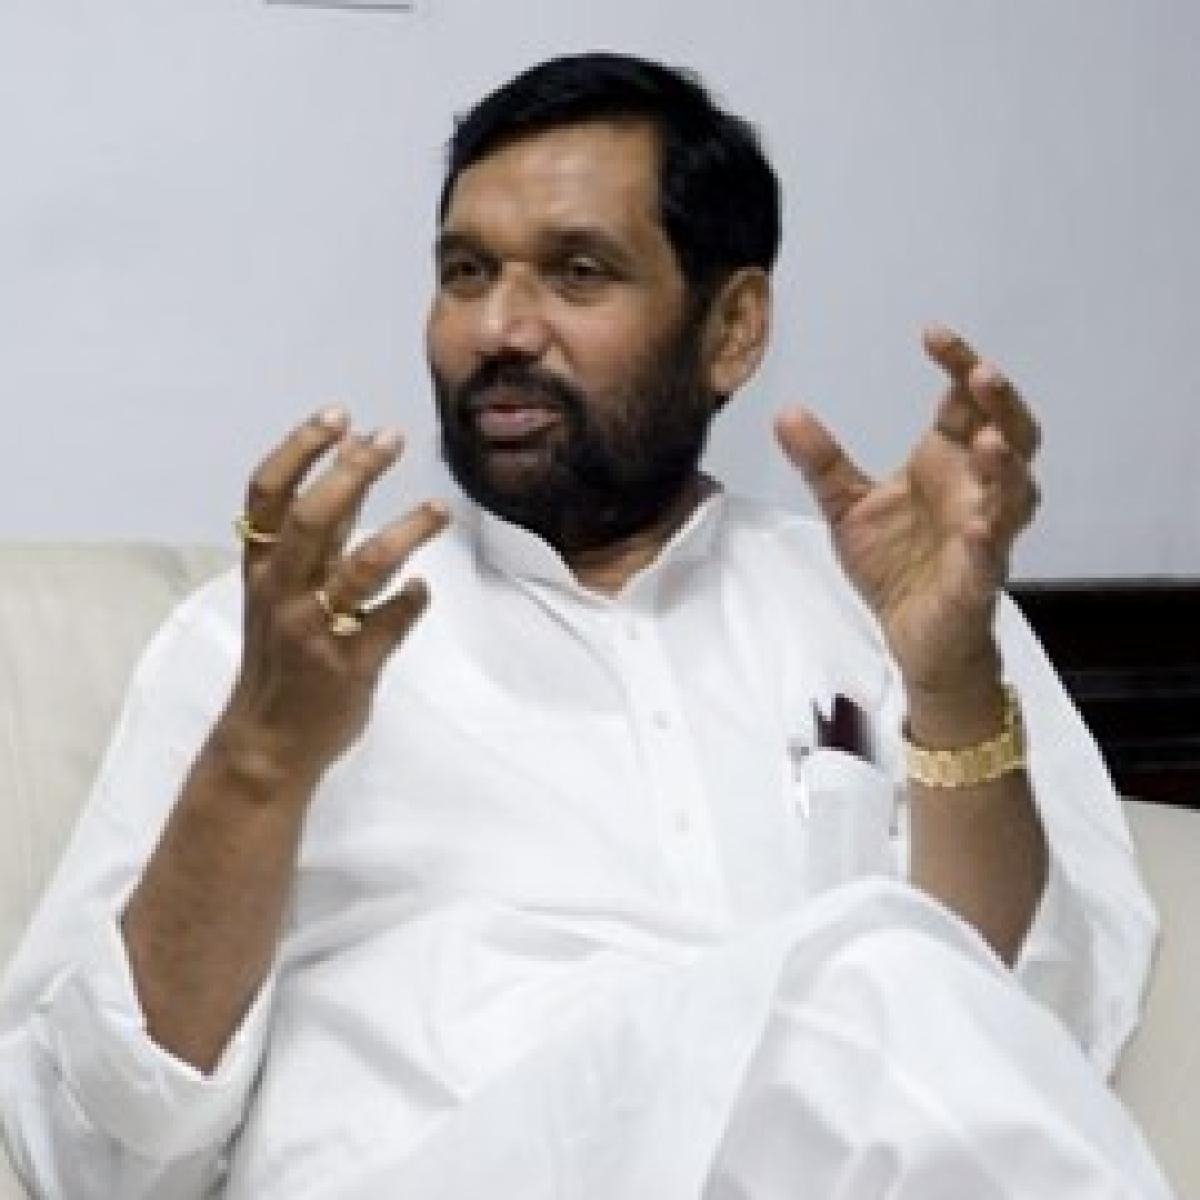 Madhya Pradesh: Digvijaya Singh accuses BJP of destroying the legacy of Ram Vilas Paswan, says they reduced the stature of Nitish Kumar by its 'kootneeti'